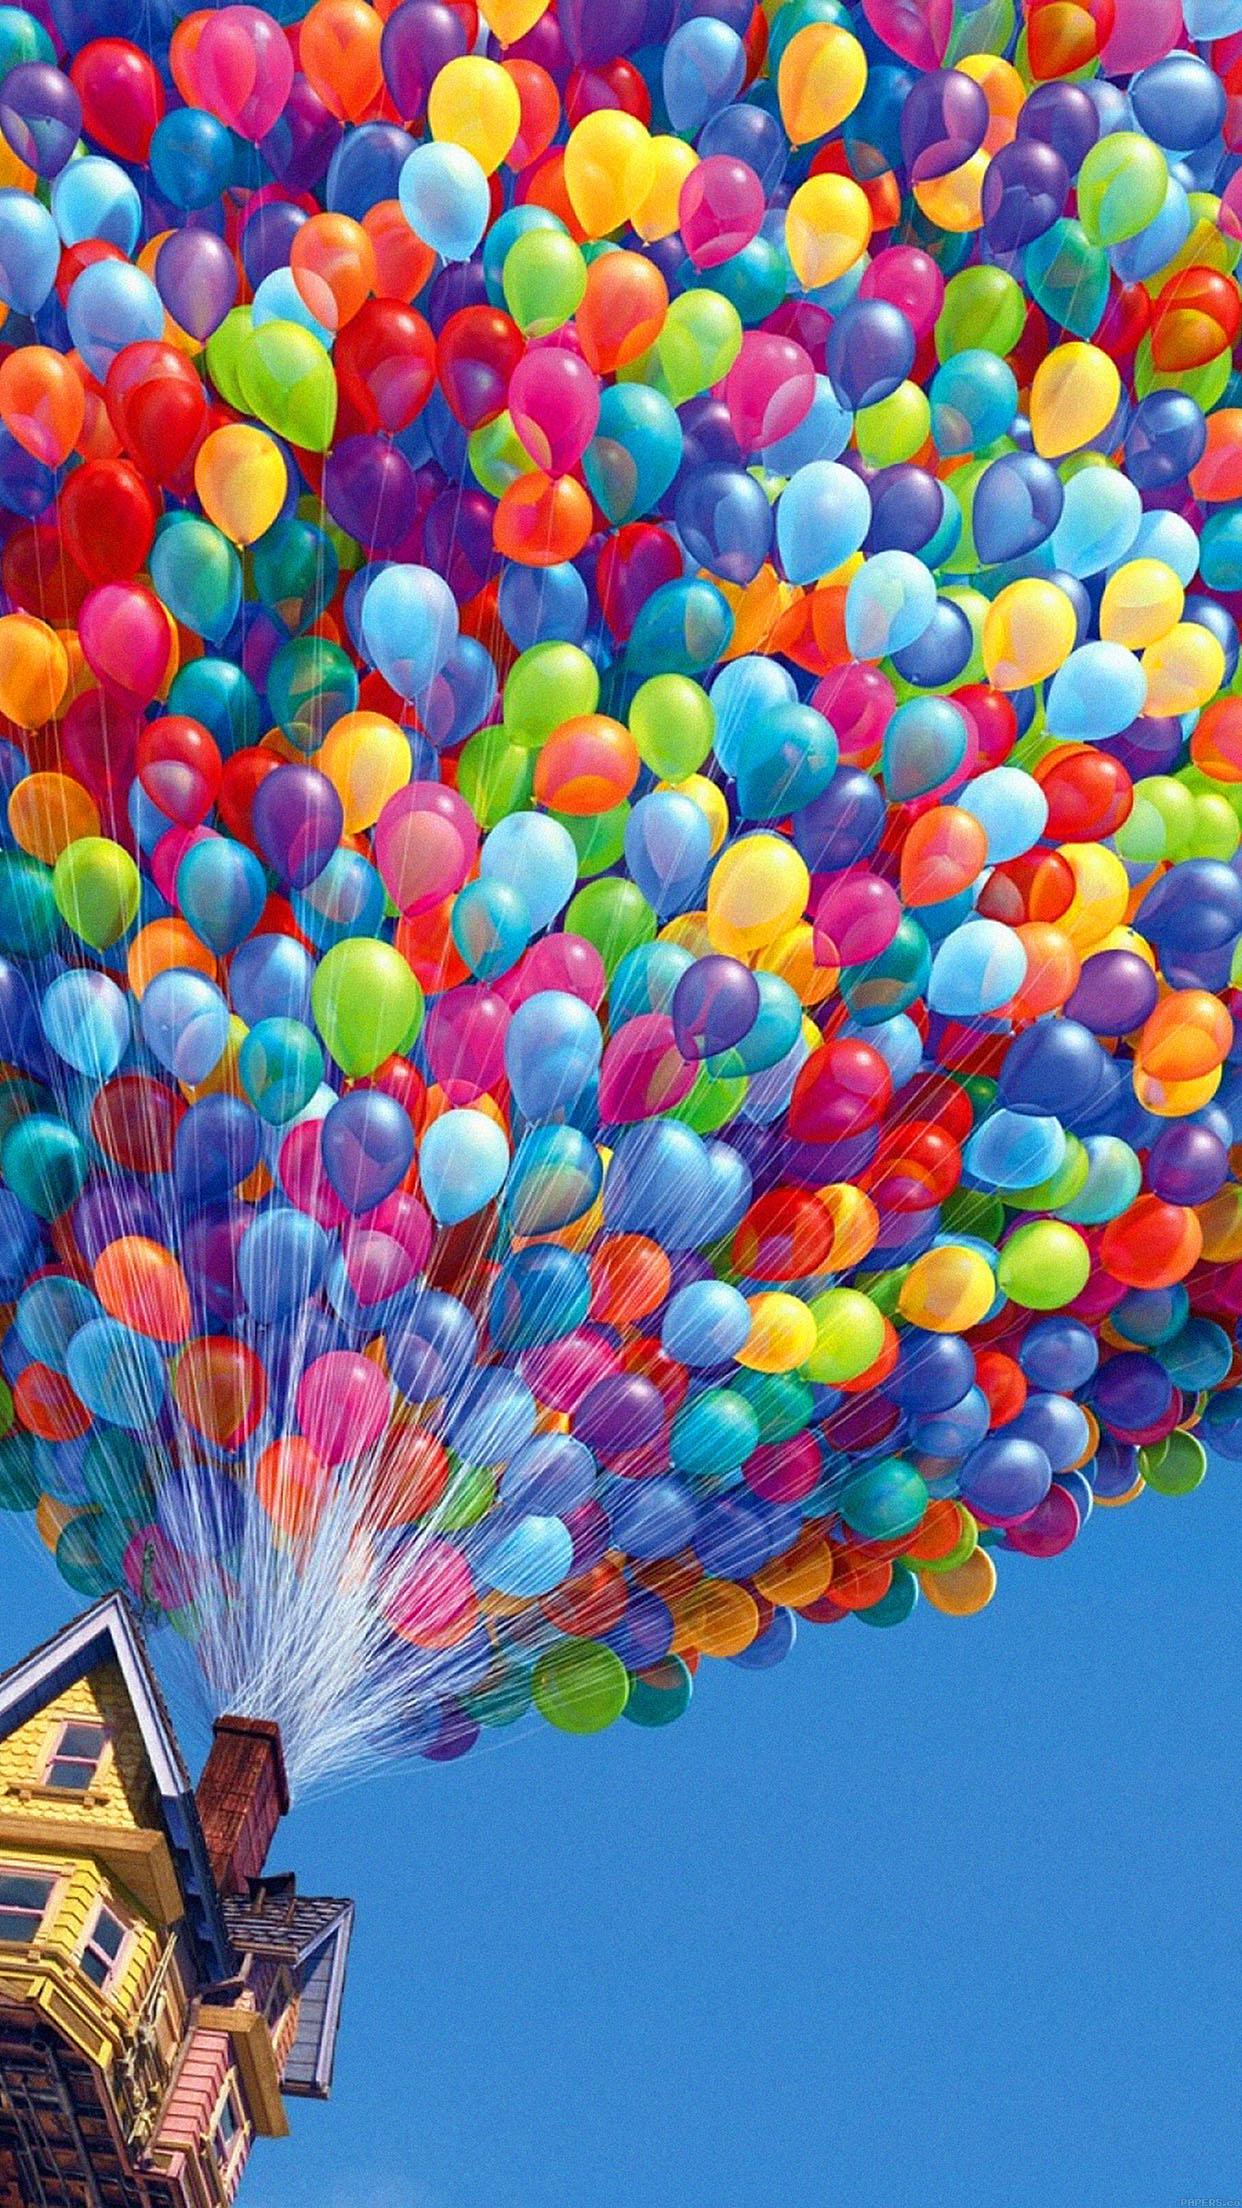 Iphone6papers Aa28 Up Balloons Disney Illust Art